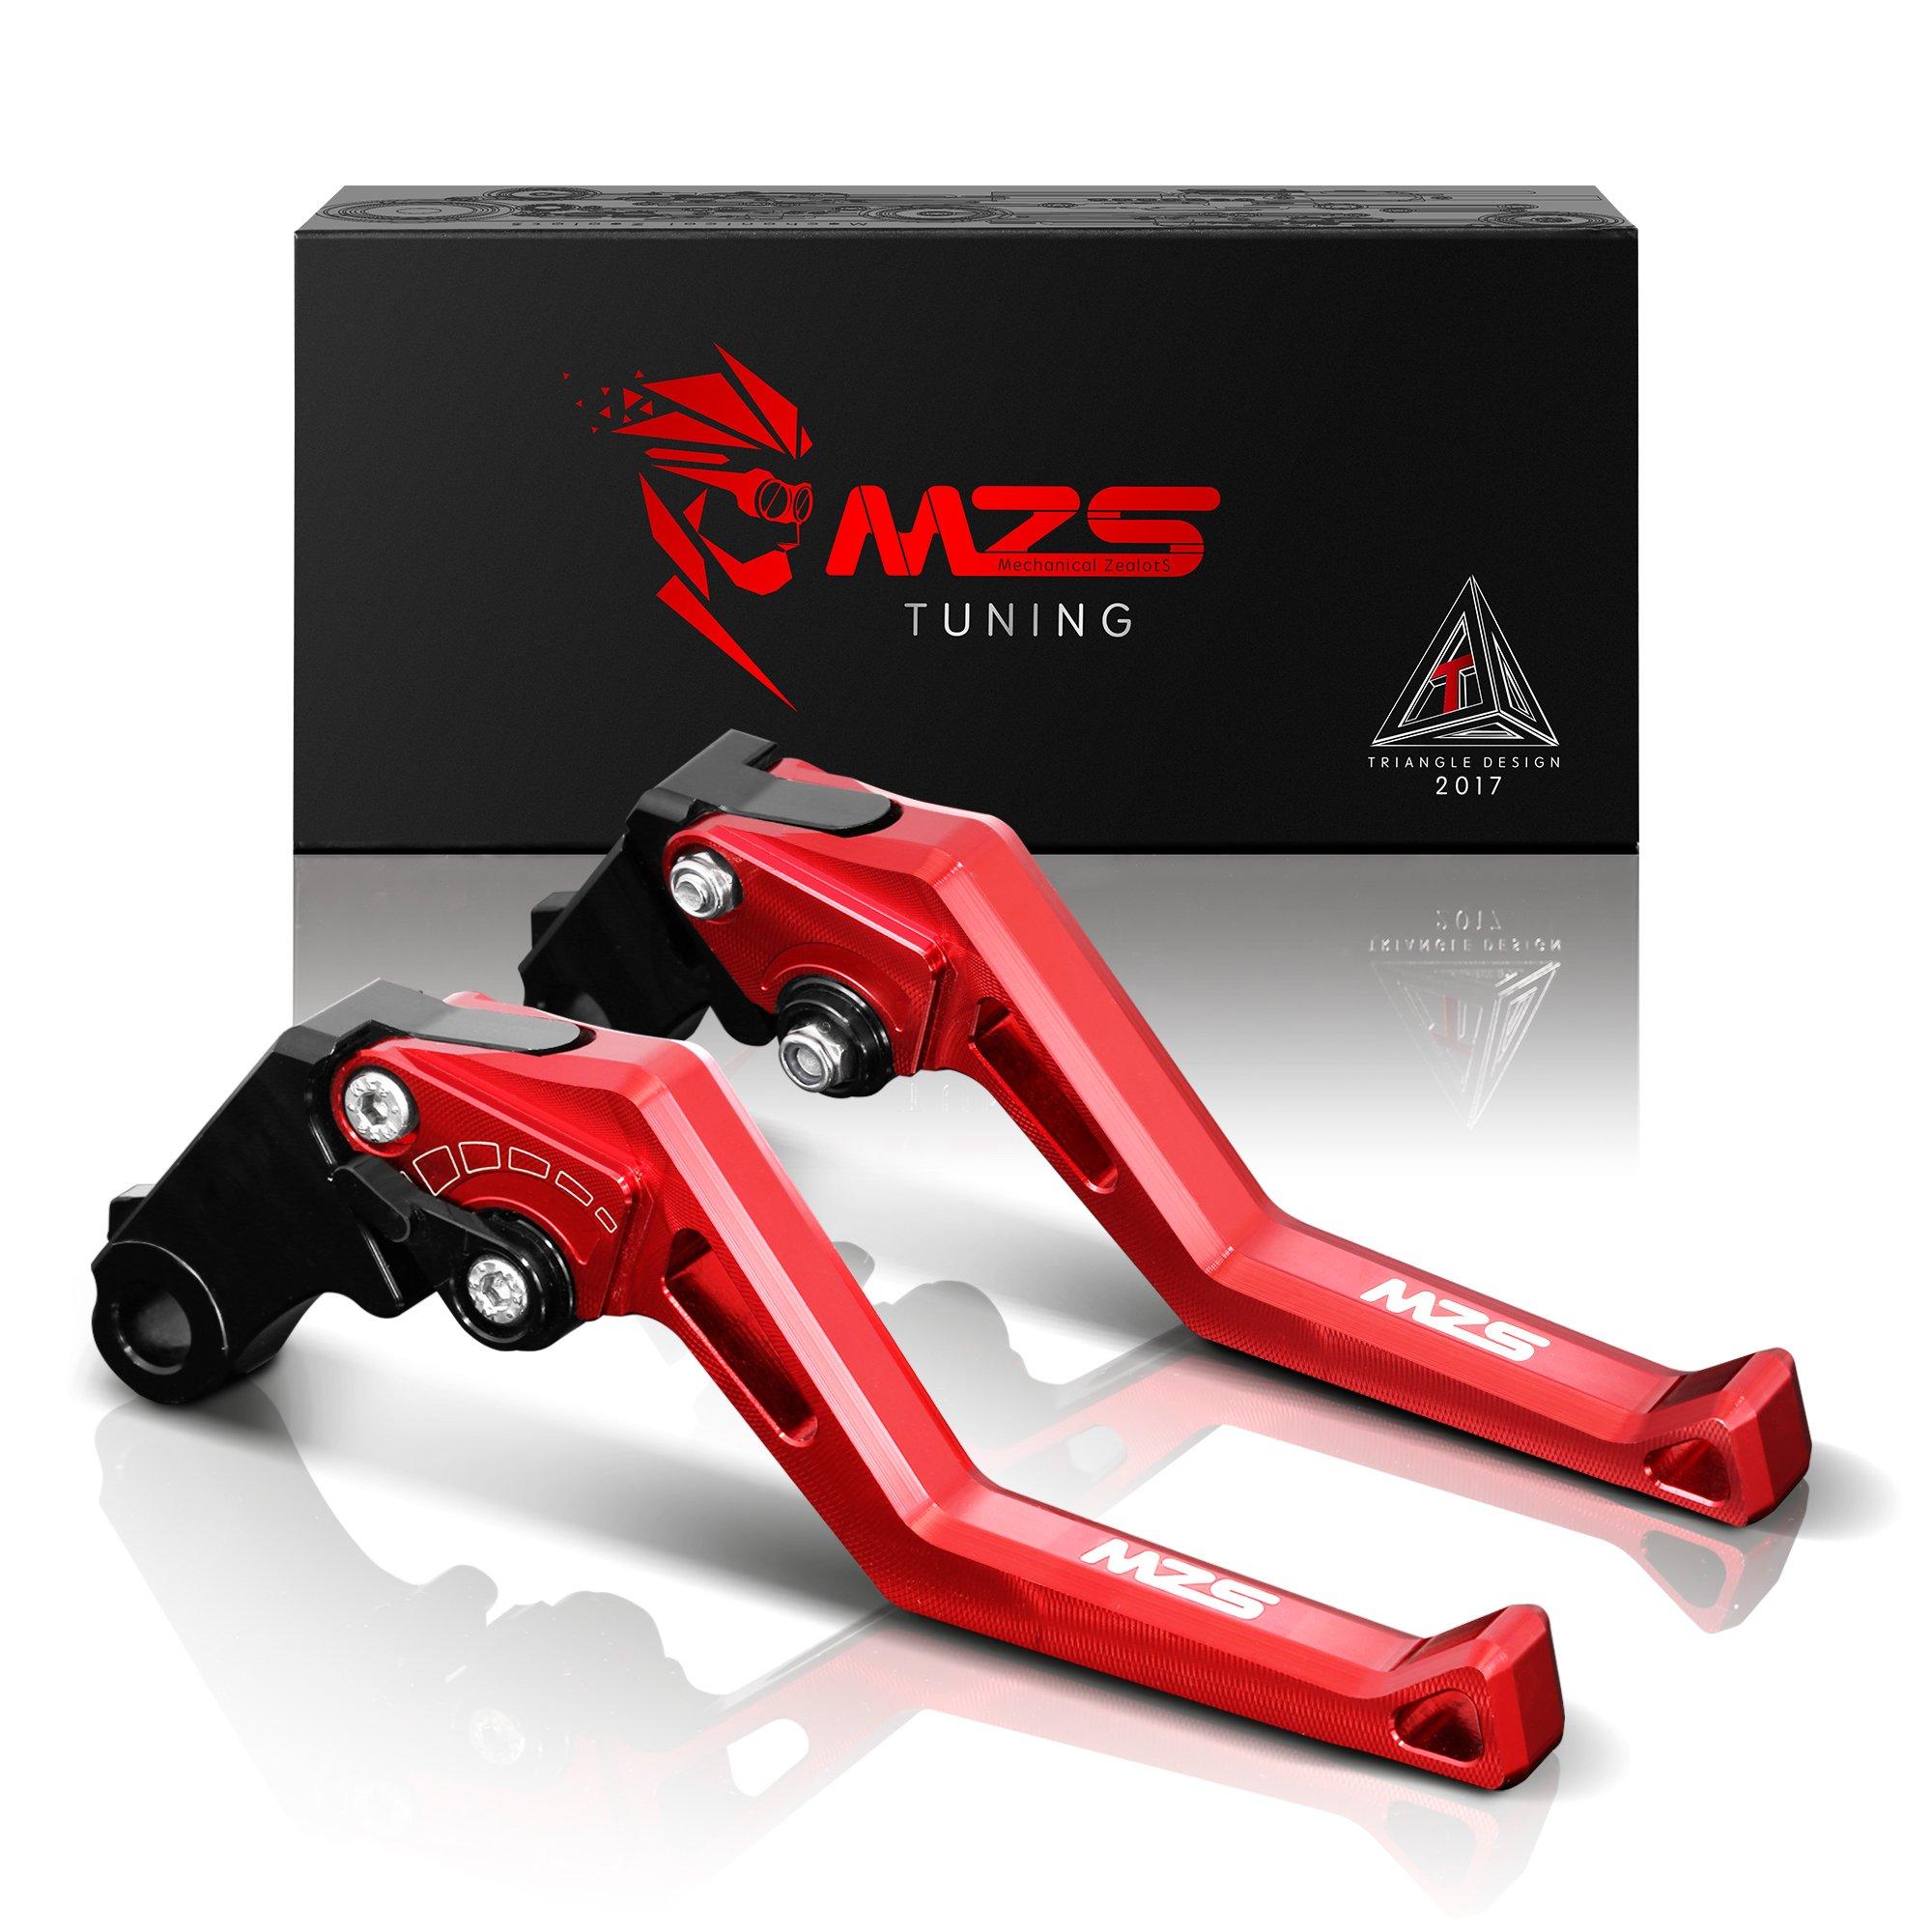 MZS Short Levers Brake Clutch Adjustment CNC for Kawasaki ZX6R ZX636 2007-2018/ ZX10R 2006-2015/ Z750R 2011-2012/ Z1000 2007-2016/ Z1000SX Tourer 2011-2016/ NINJA 1000 2011-2016 Red